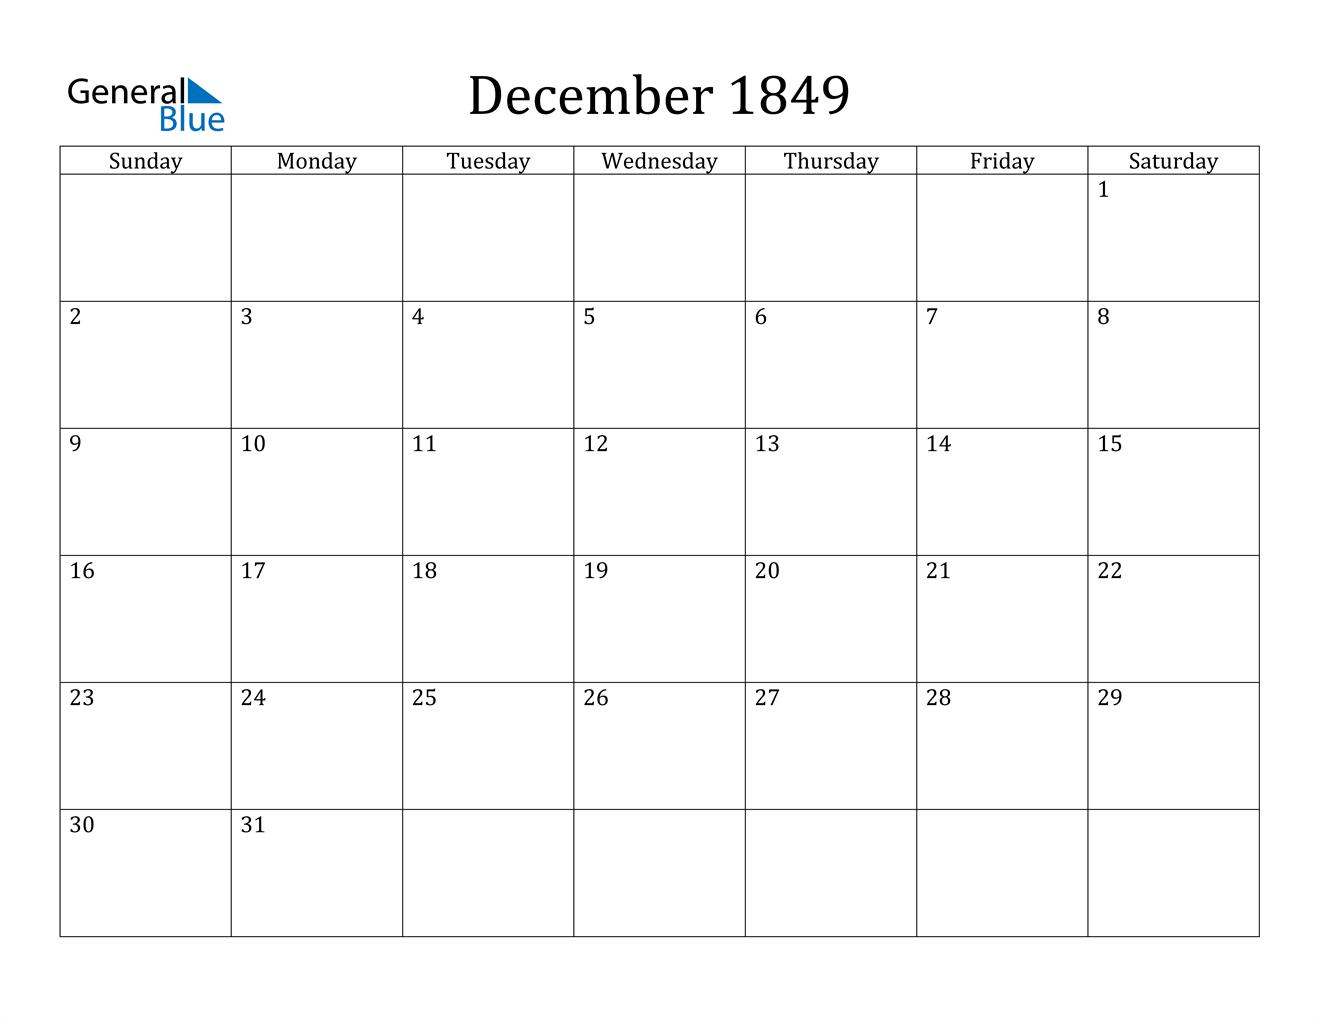 Image of December 1849 Calendar